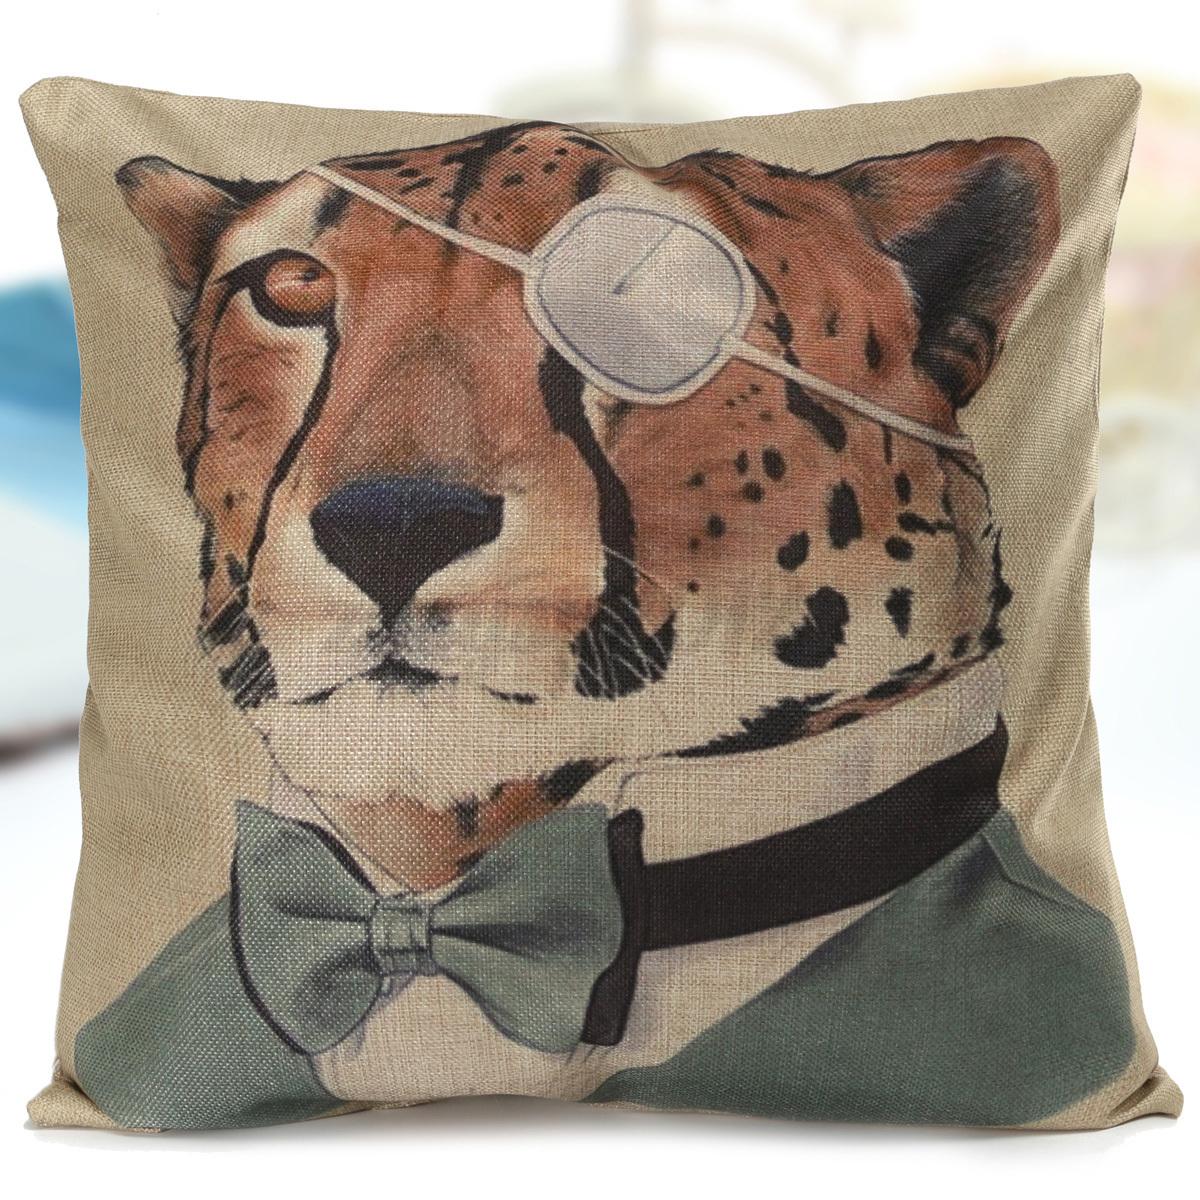 Doomagic Animal Pillow Case : Animal CAT DOG Koala Penguin Tiger Cushion Cover Home CAR Decor Pillow Case NEW eBay